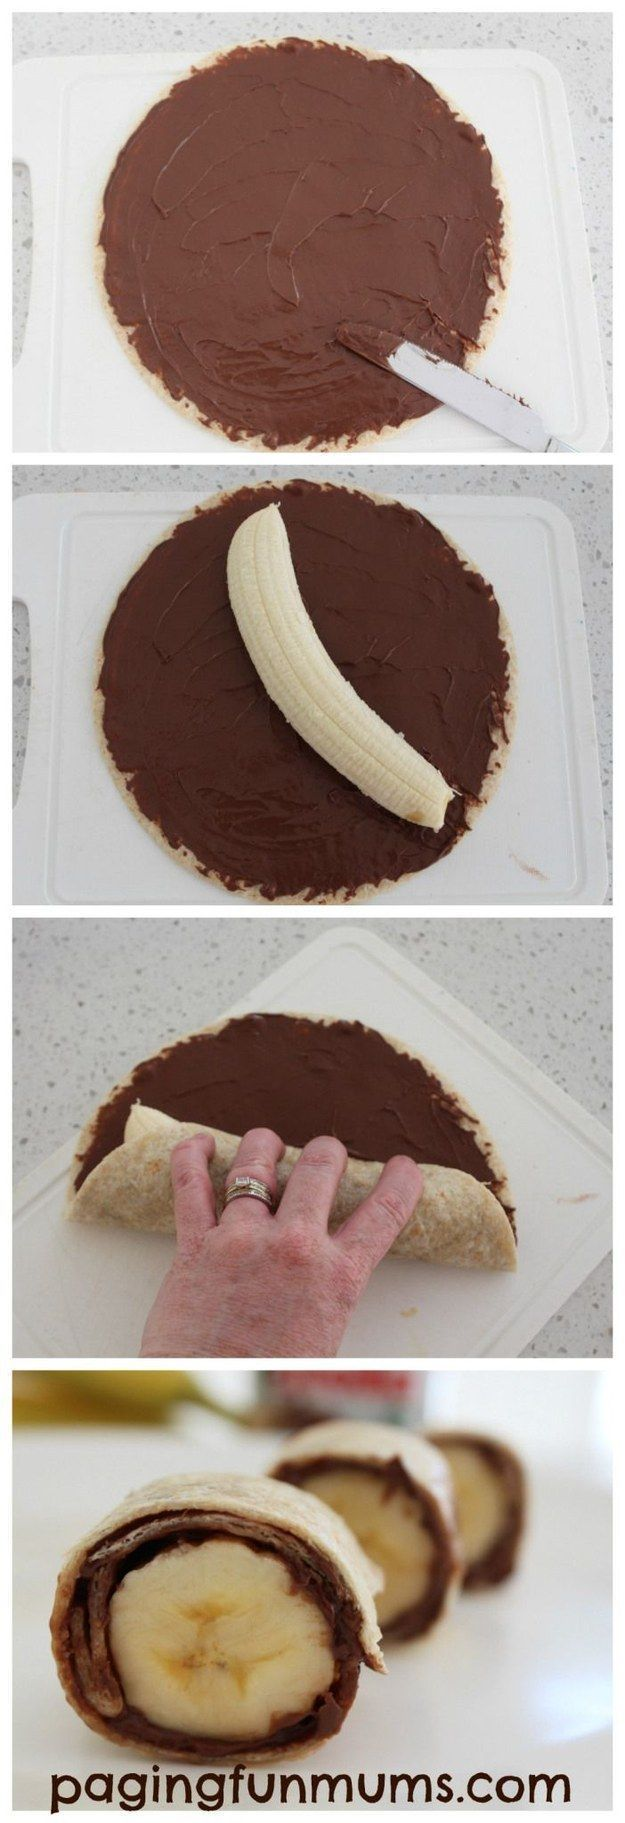 Nutella & Banana Sushi   21 Back-To-School Breakfast Recipes That Kids Will Love